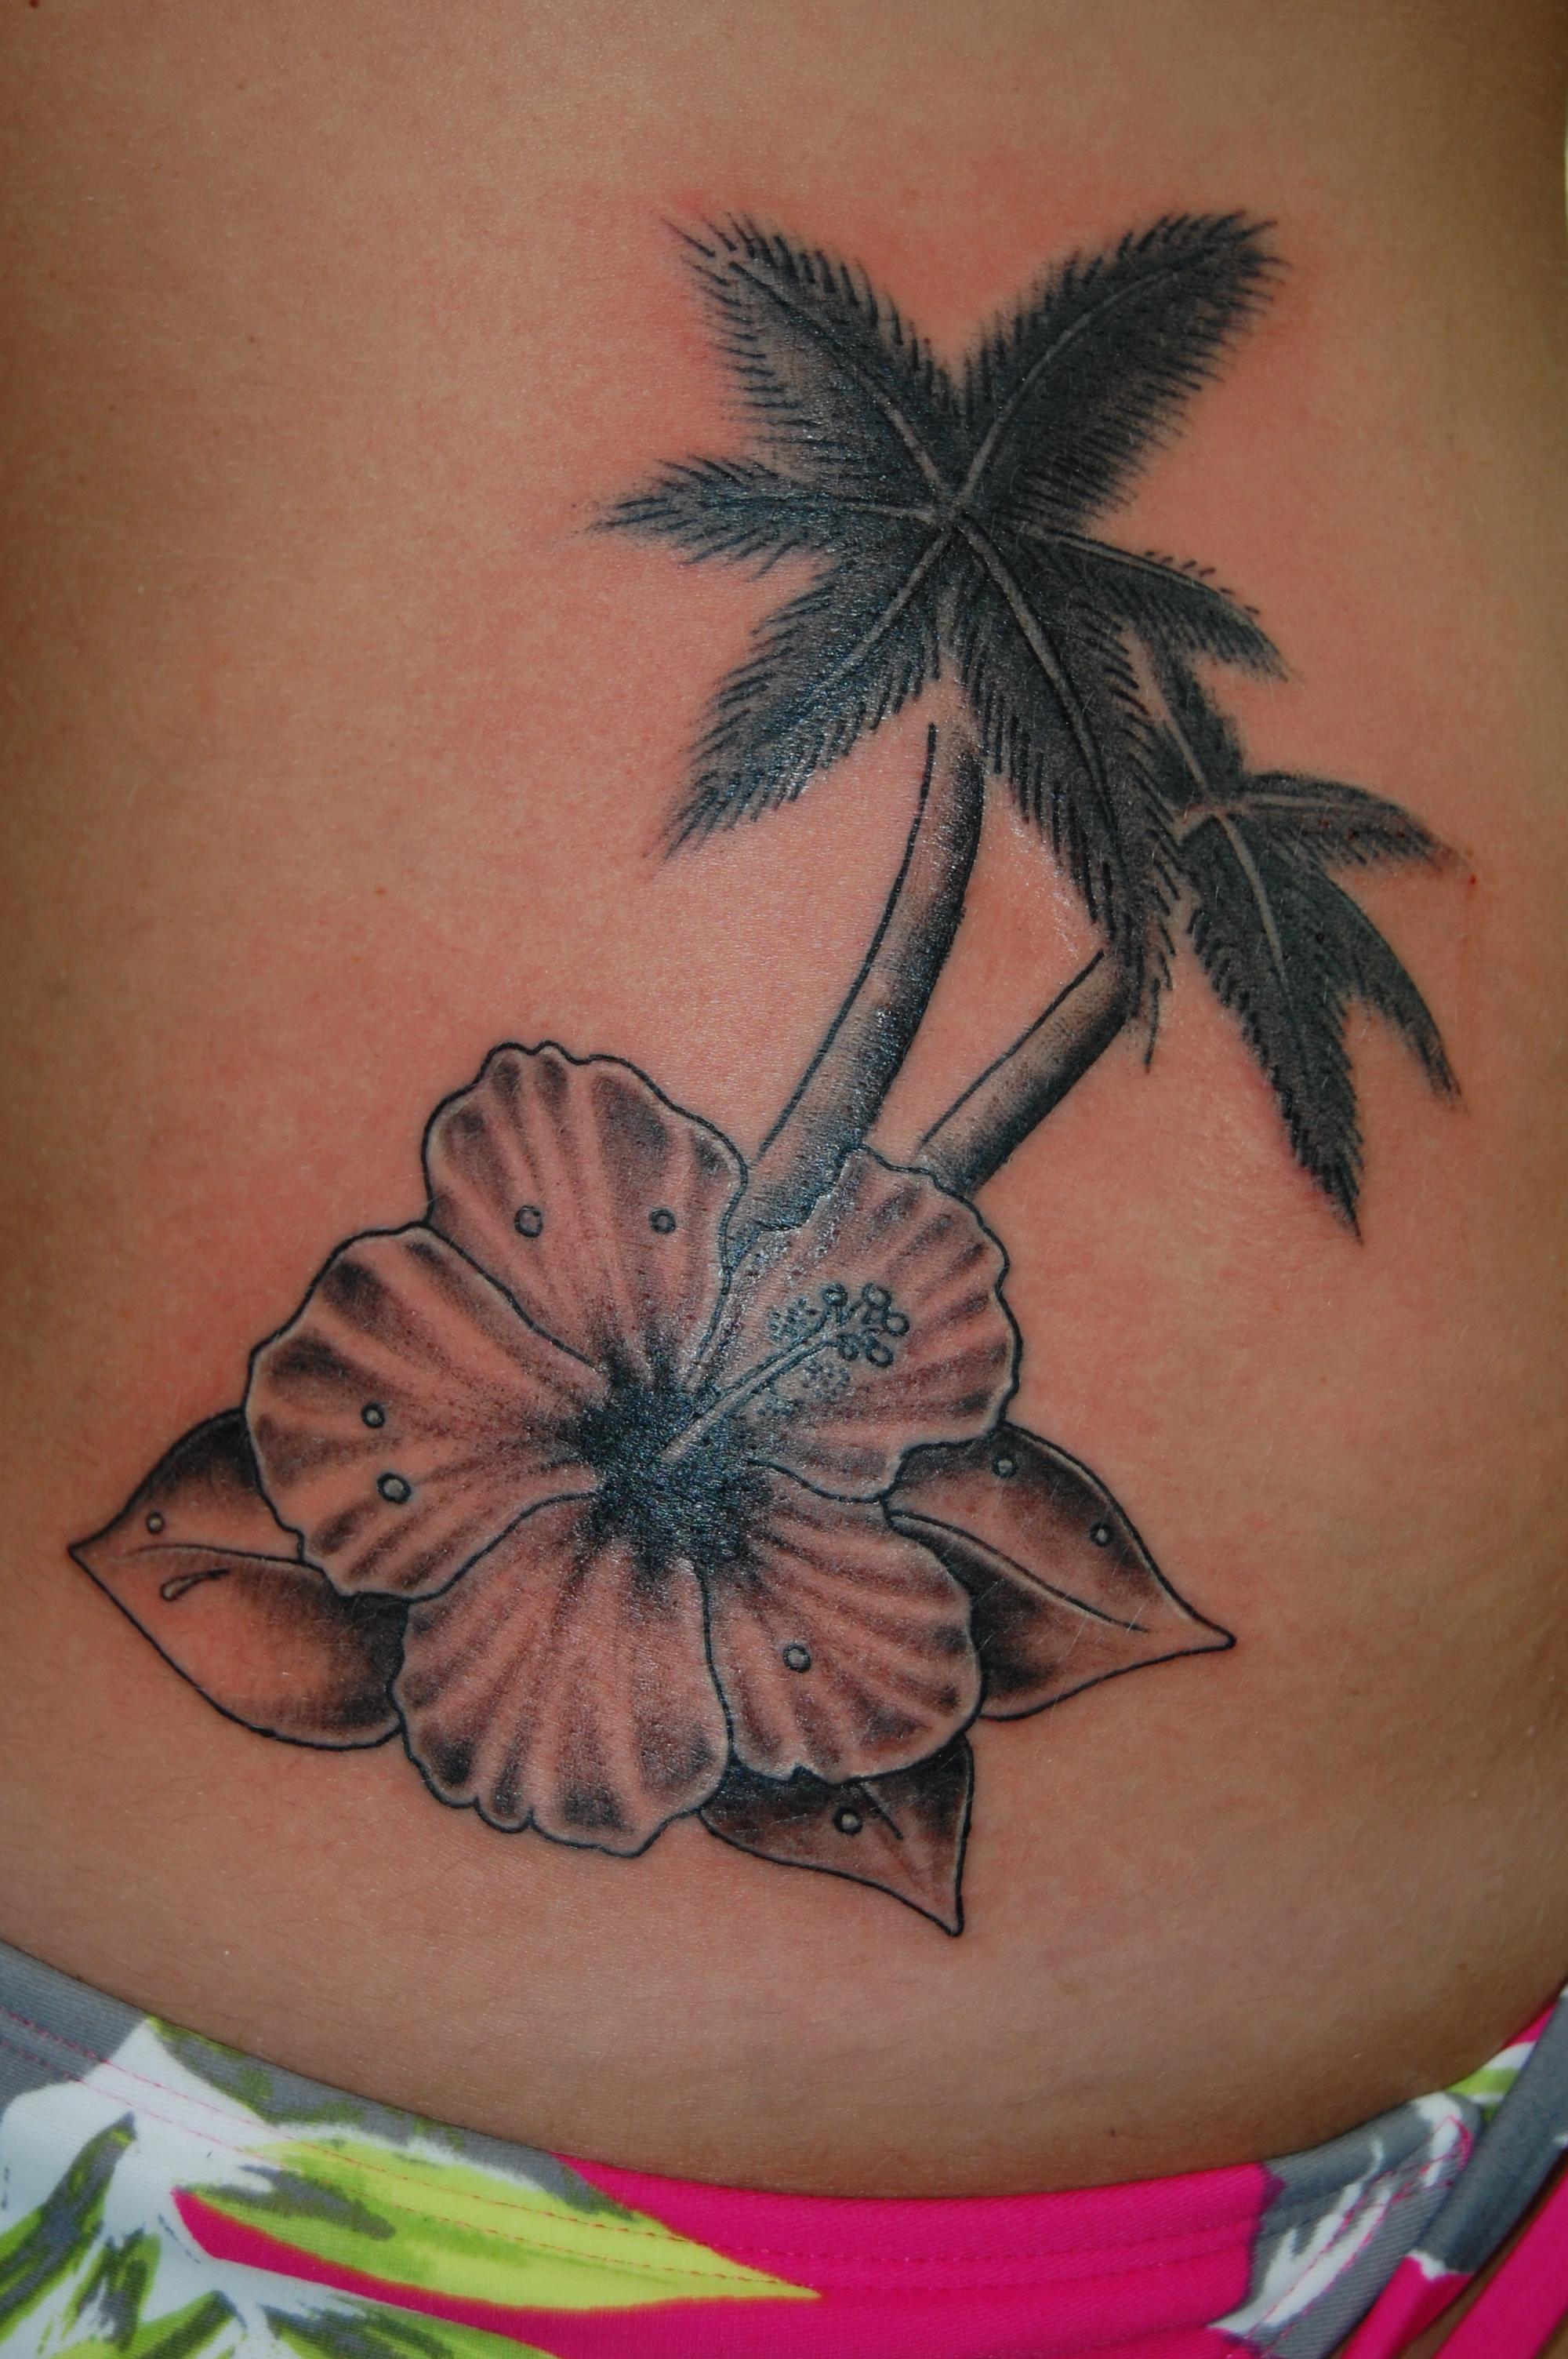 Tattoo Artist Jason Covington